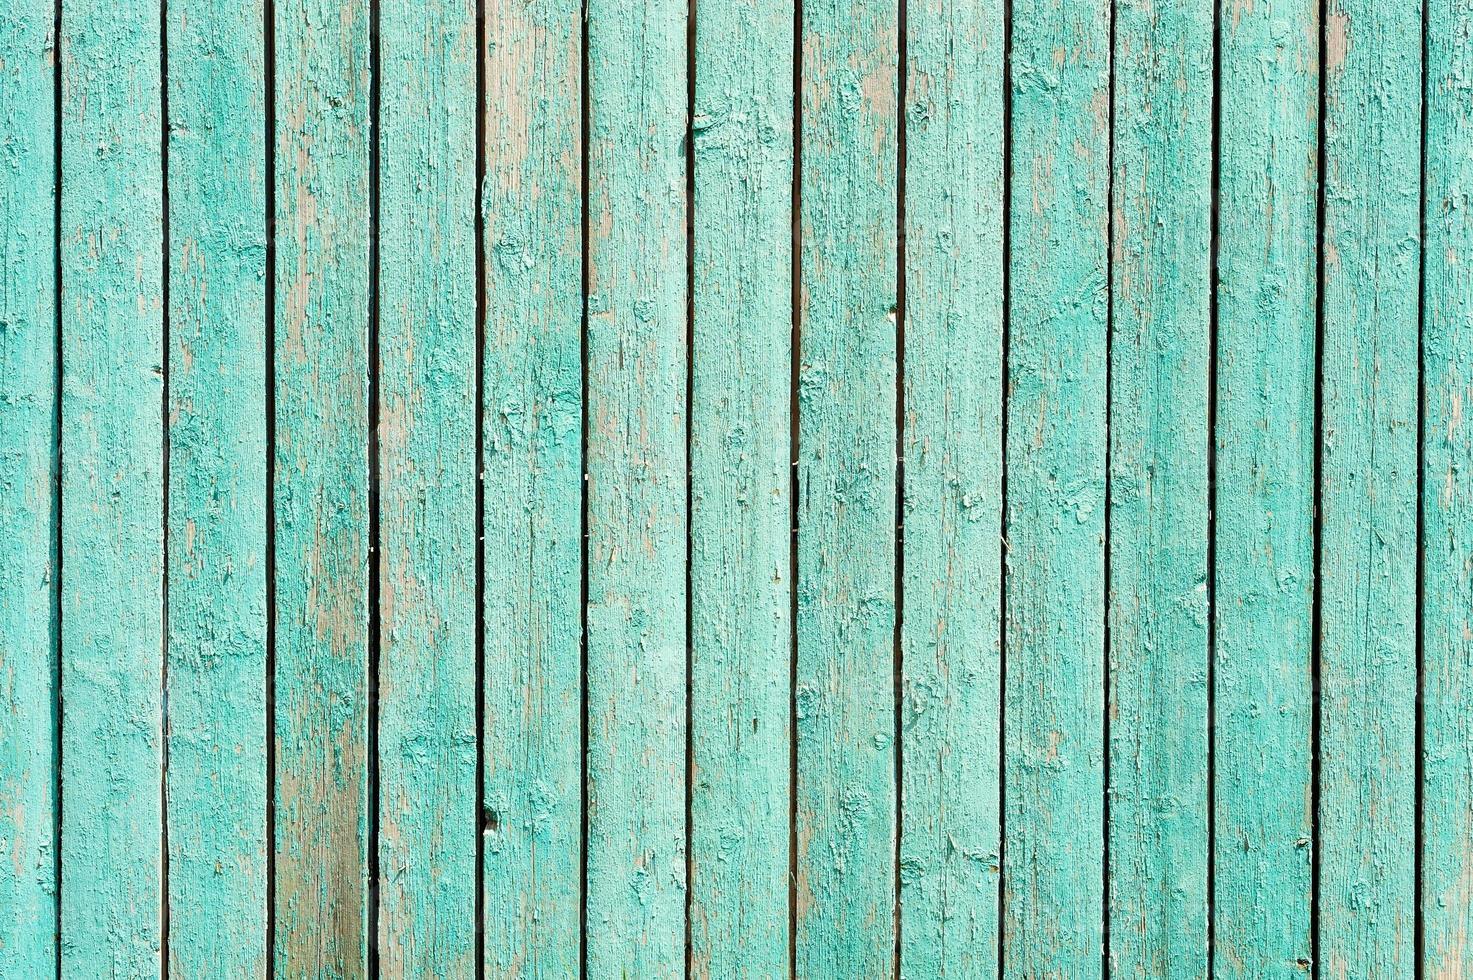 groene houten hek achtergrond foto